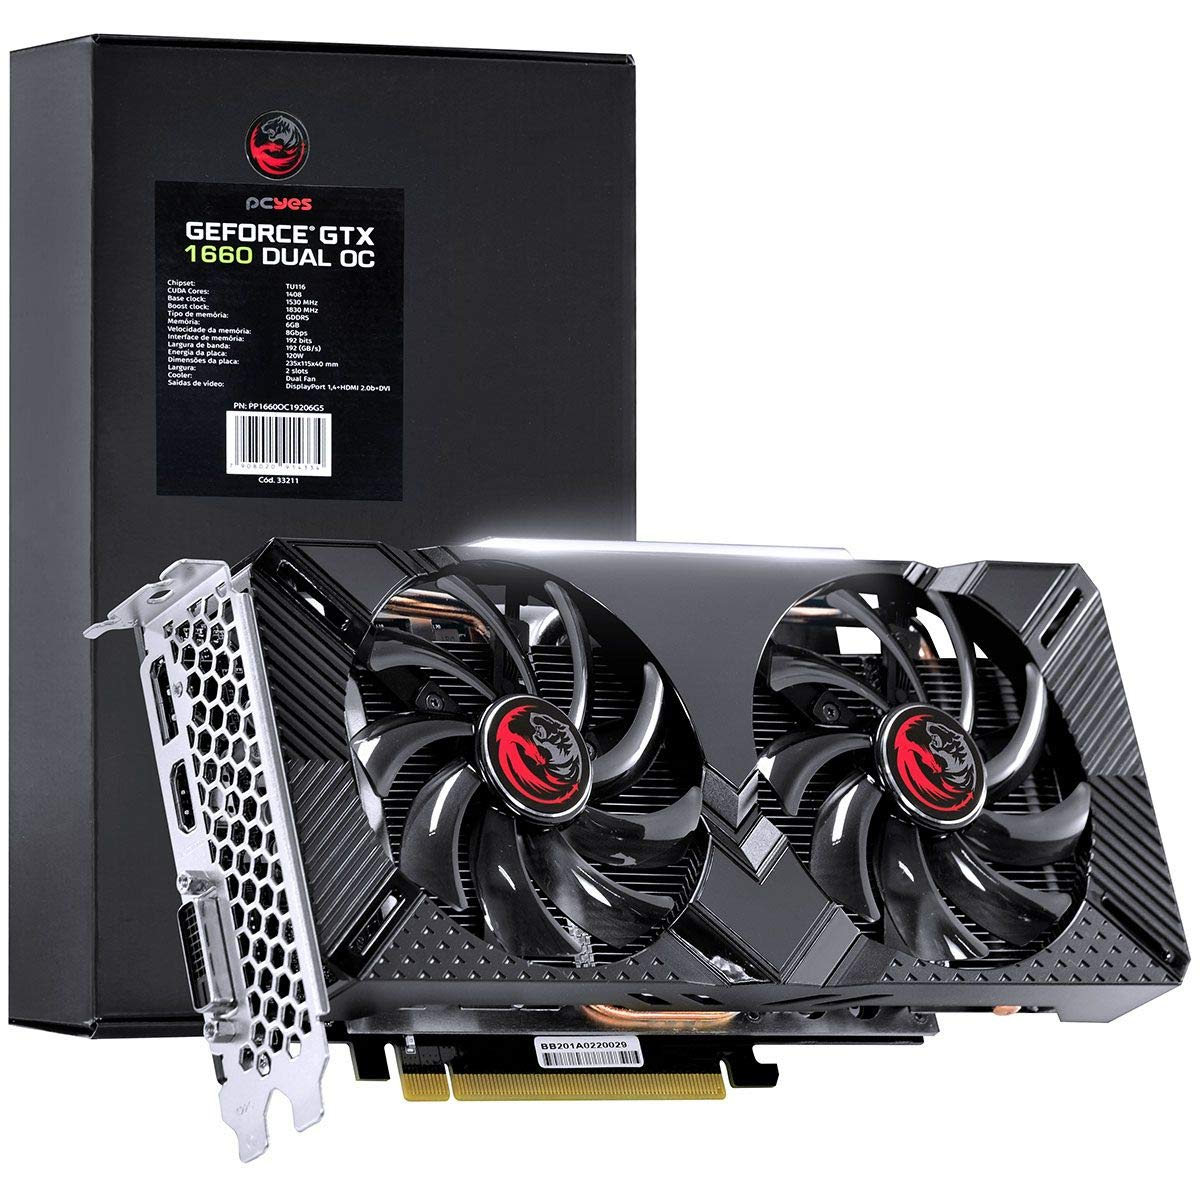 GEFORCE GTX 1660 DUAL OC 6GB GDDR5 192BIT